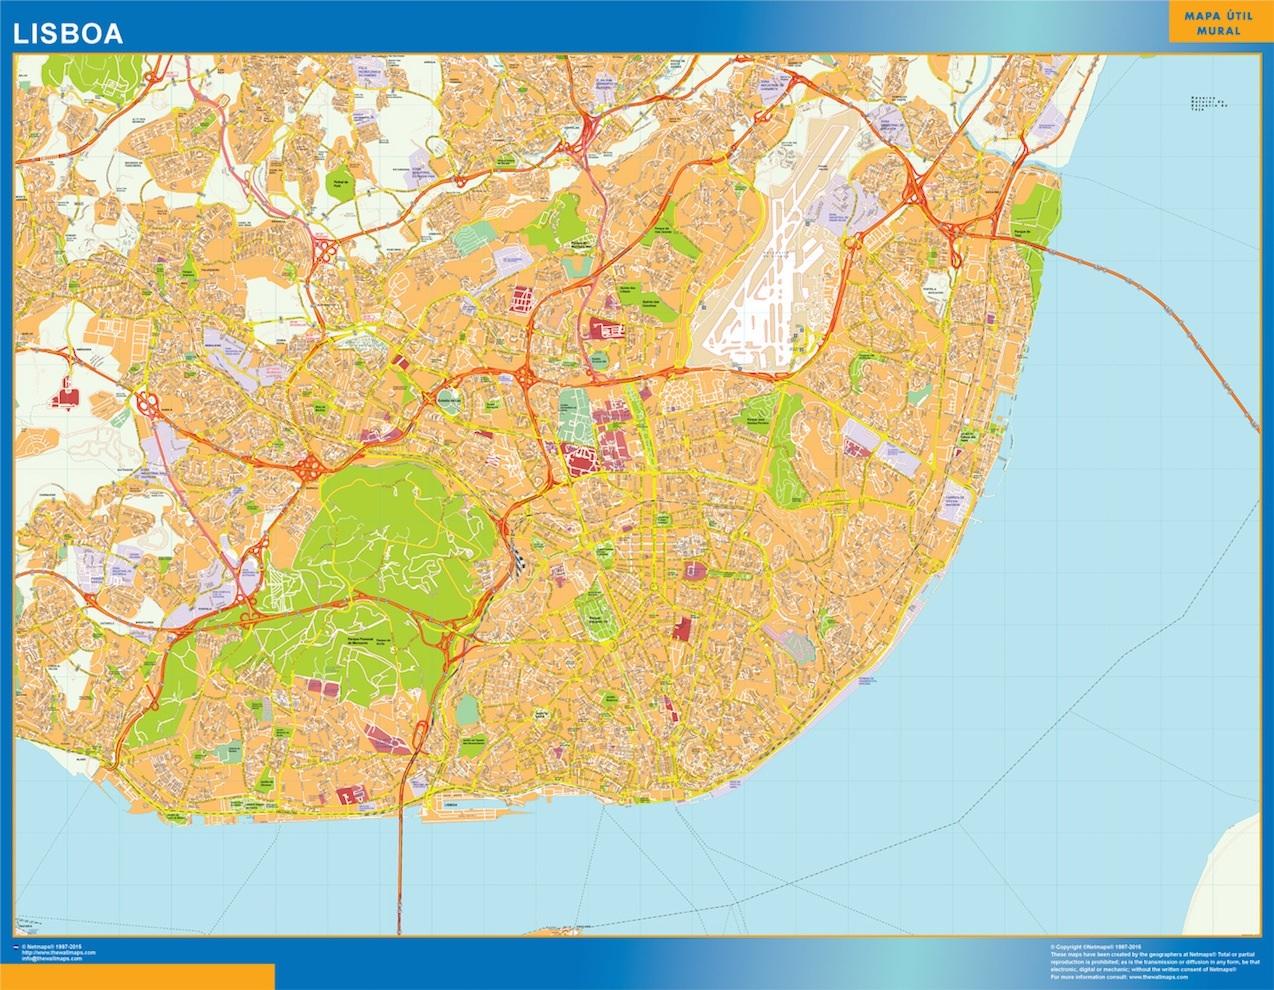 mapa de lisboa online Mapa Lisboa Portugal | Tienda de mapas gigantes de España y el mundo mapa de lisboa online